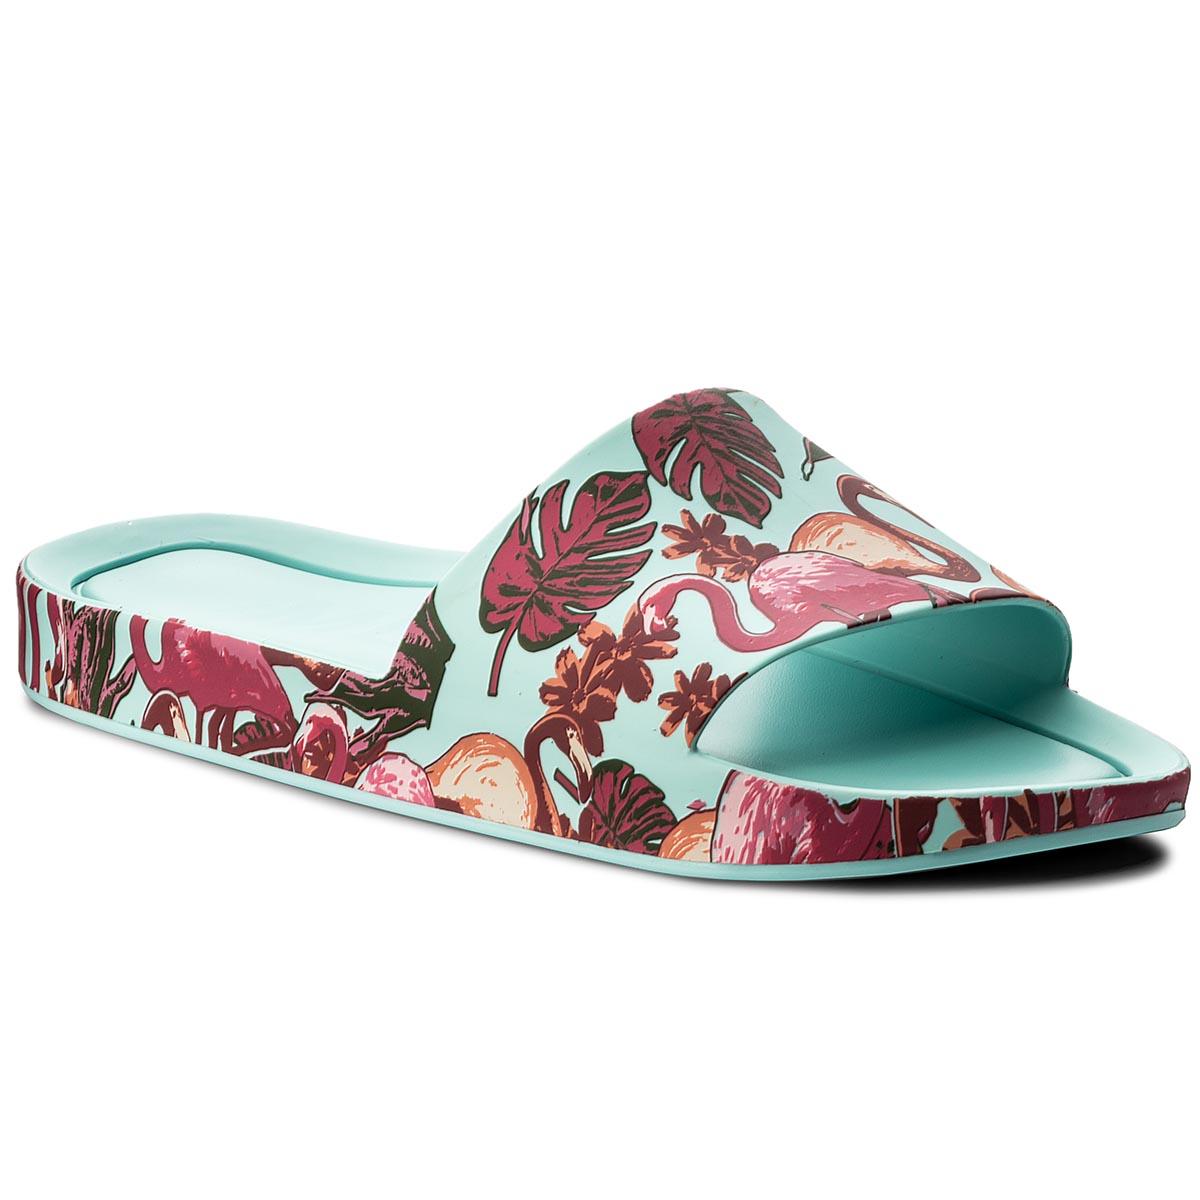 7b1ec77e42 Slides MELISSA - Beach Slide Platform A 32350 White Pink 50600 ...